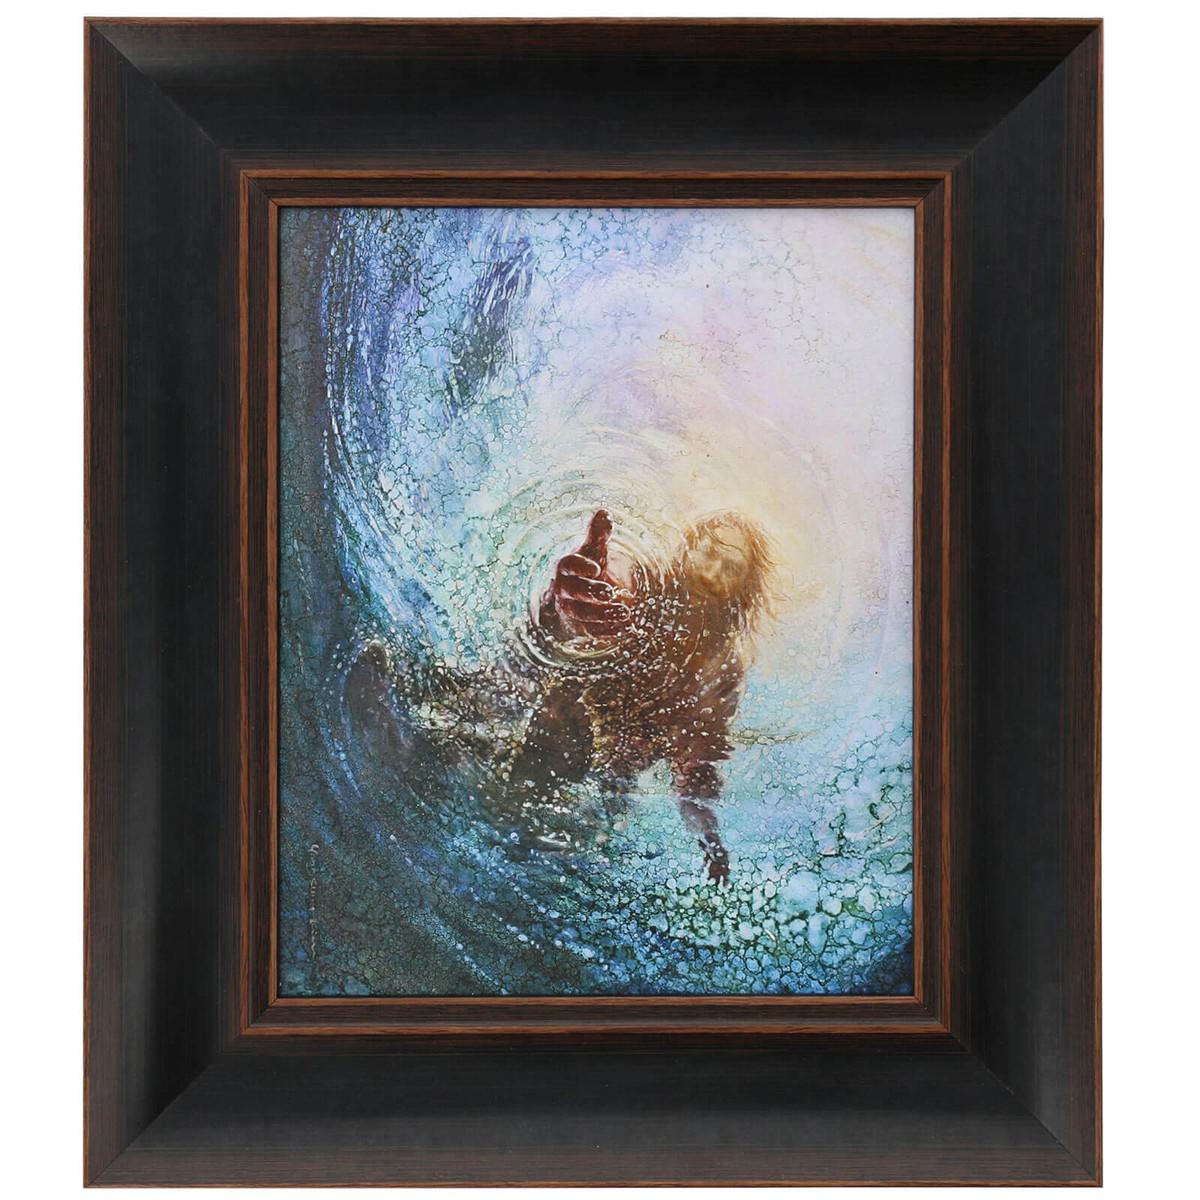 Framed Art: The Hand of God by Yongsung Kim - 12\